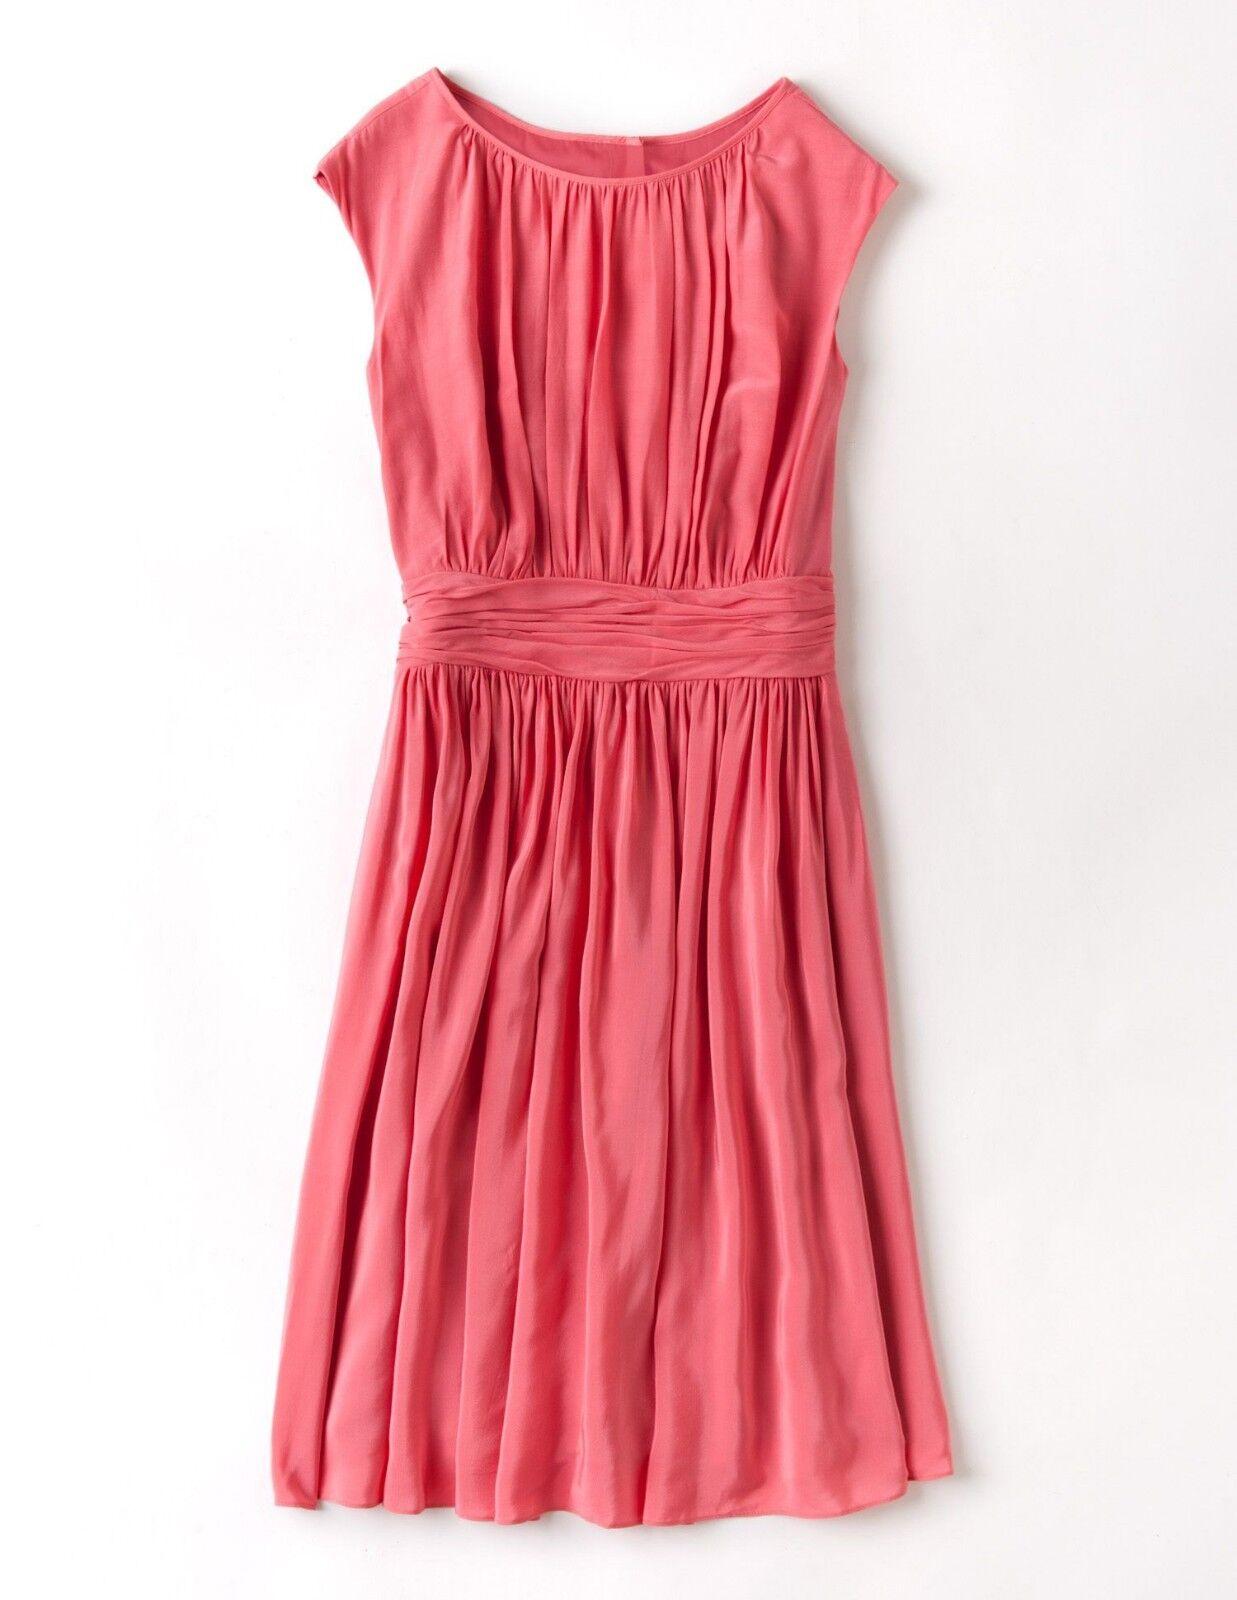 f14f94732f2760 BODEN damen CARNATION SALMON Rosa DRESS -UK 18- 'SELINA' PLEATED  npfdrg2133-Kleider